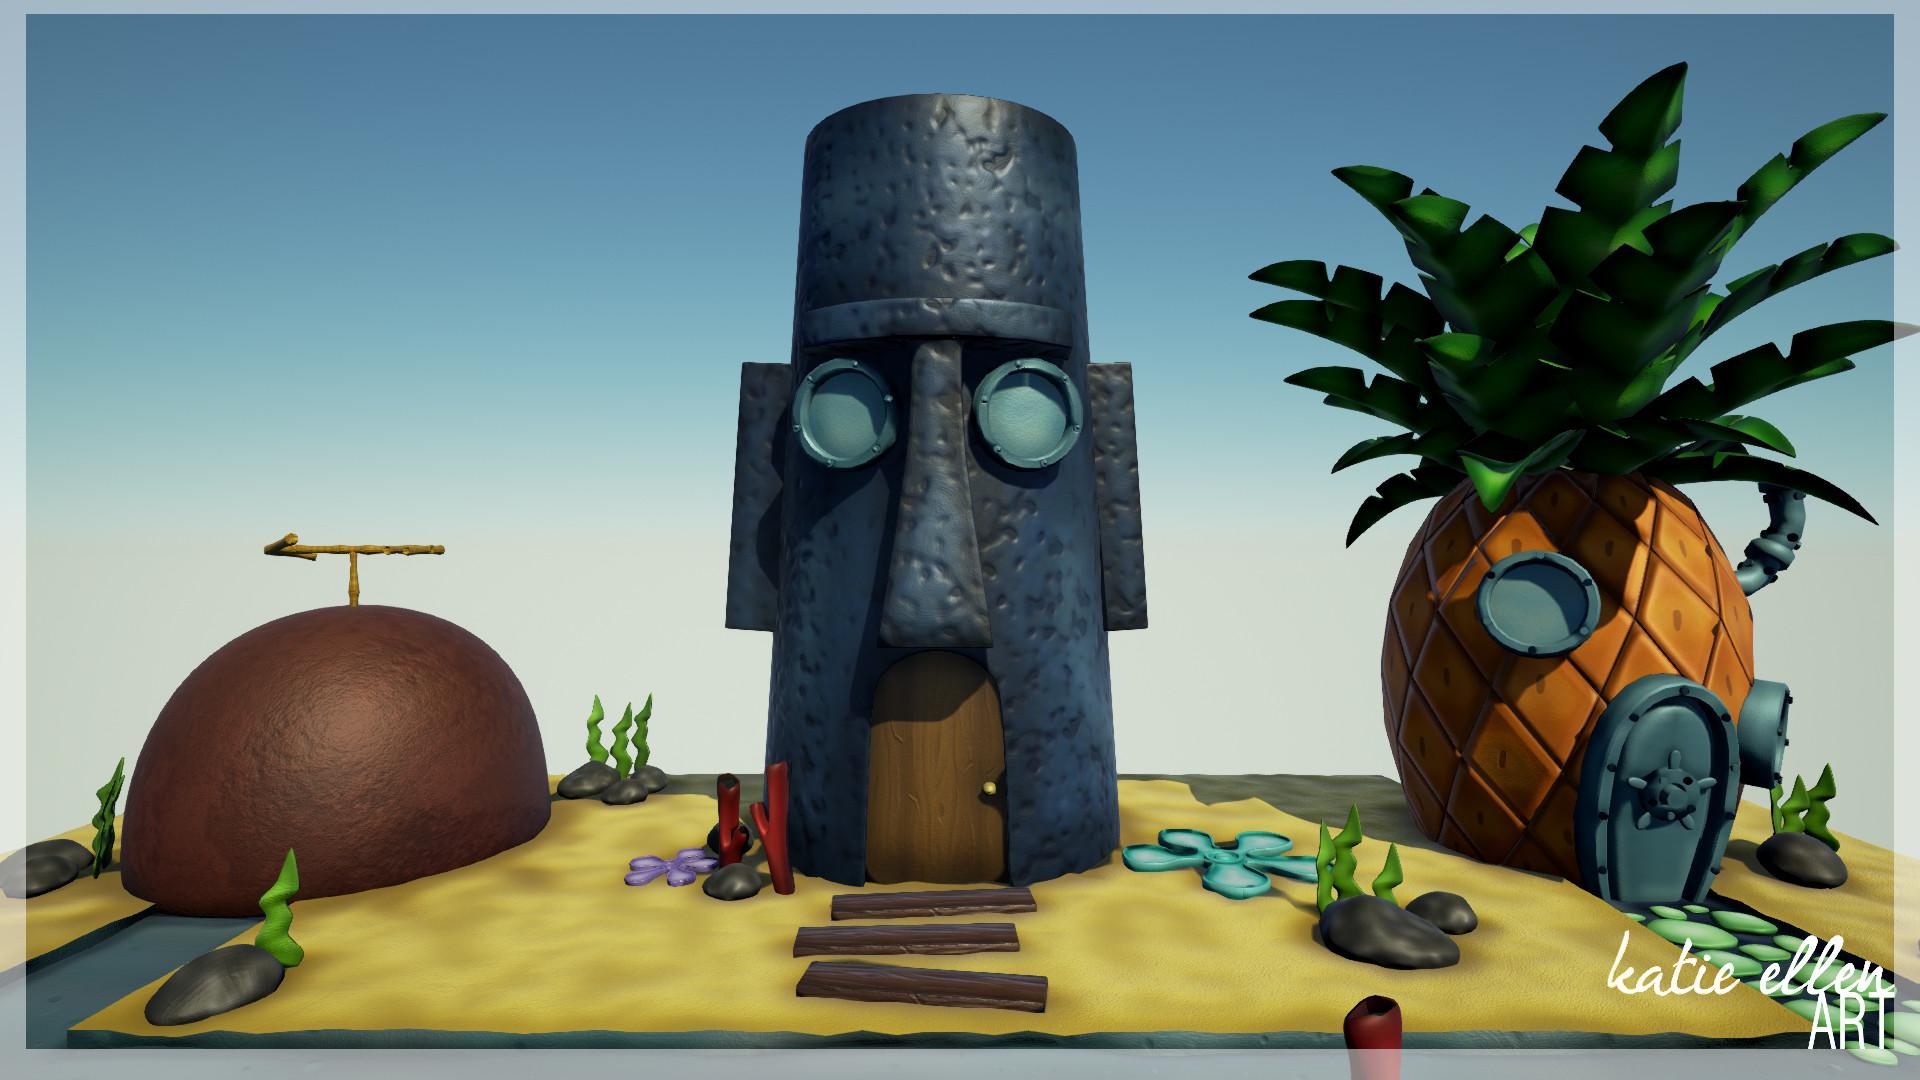 artstation - spongebob squarepants environment, katie ellen robinson